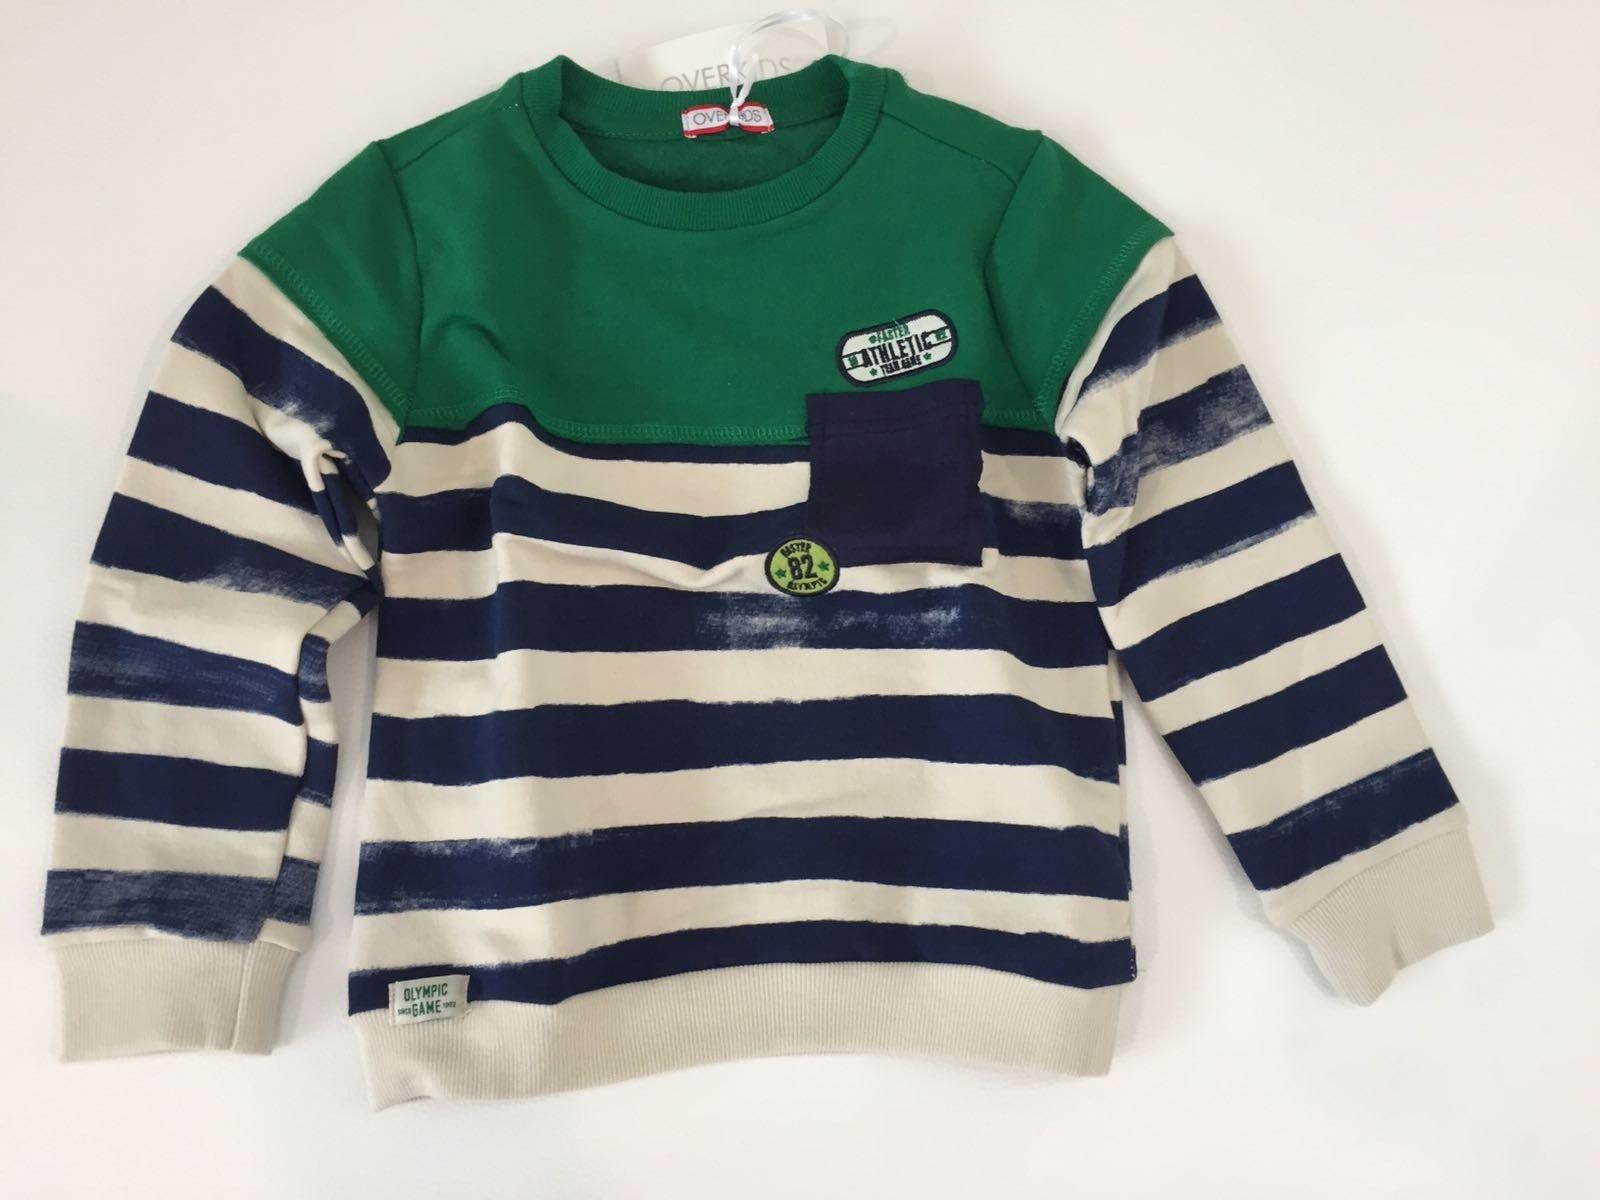 63618f67946e Stocklot children s clothing - Stock Italy Srl